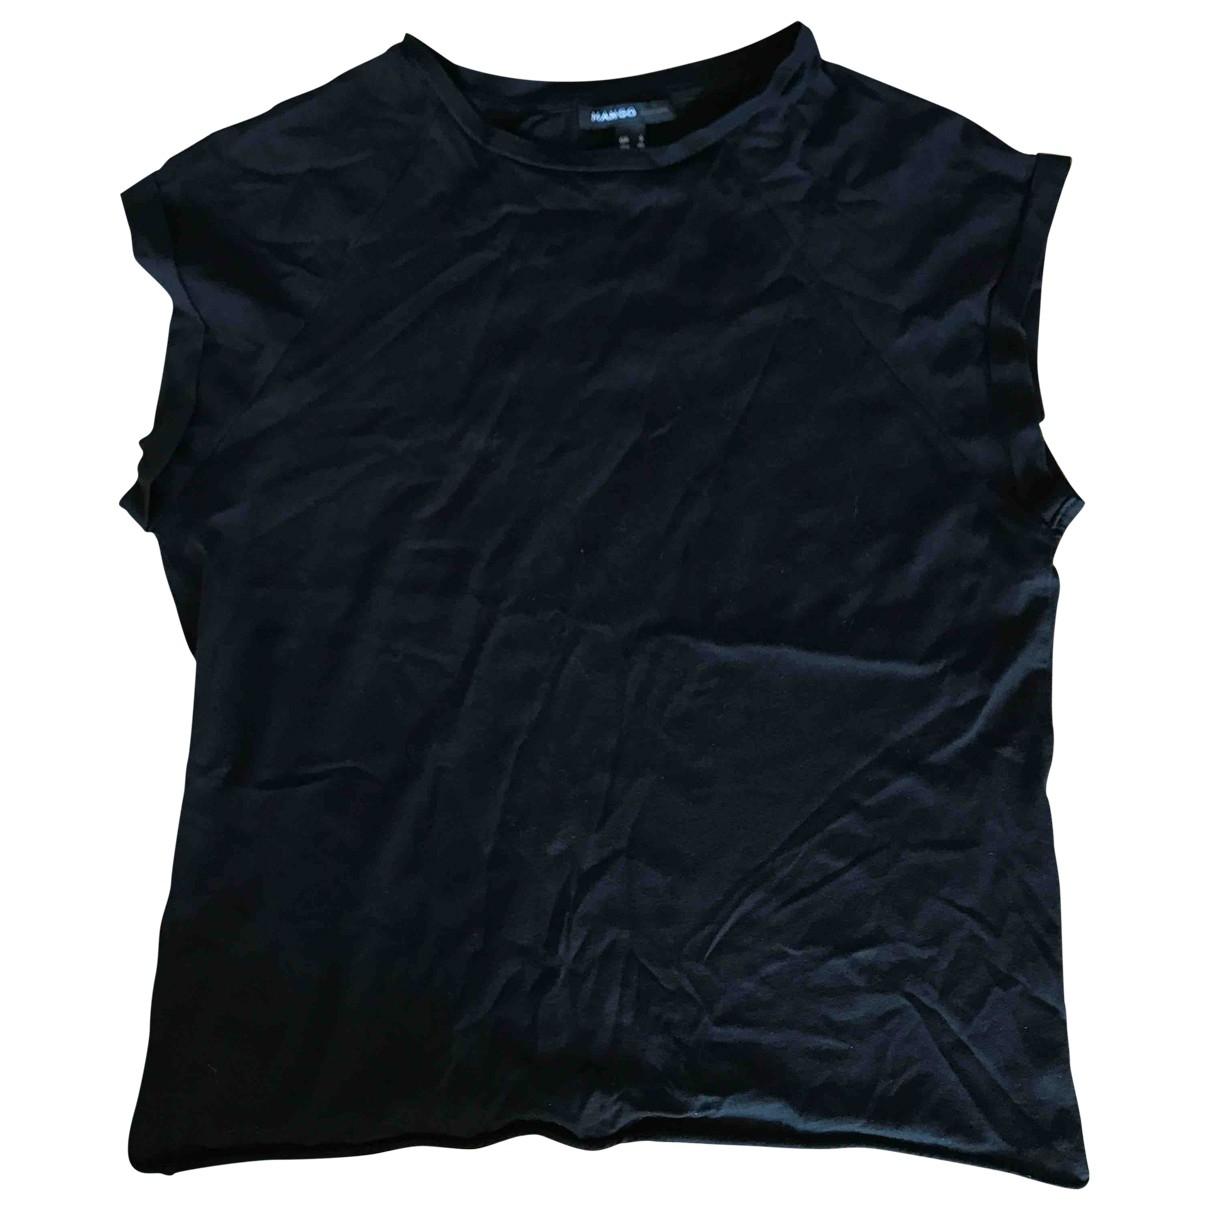 Mango \N Black Cotton  top for Women S International